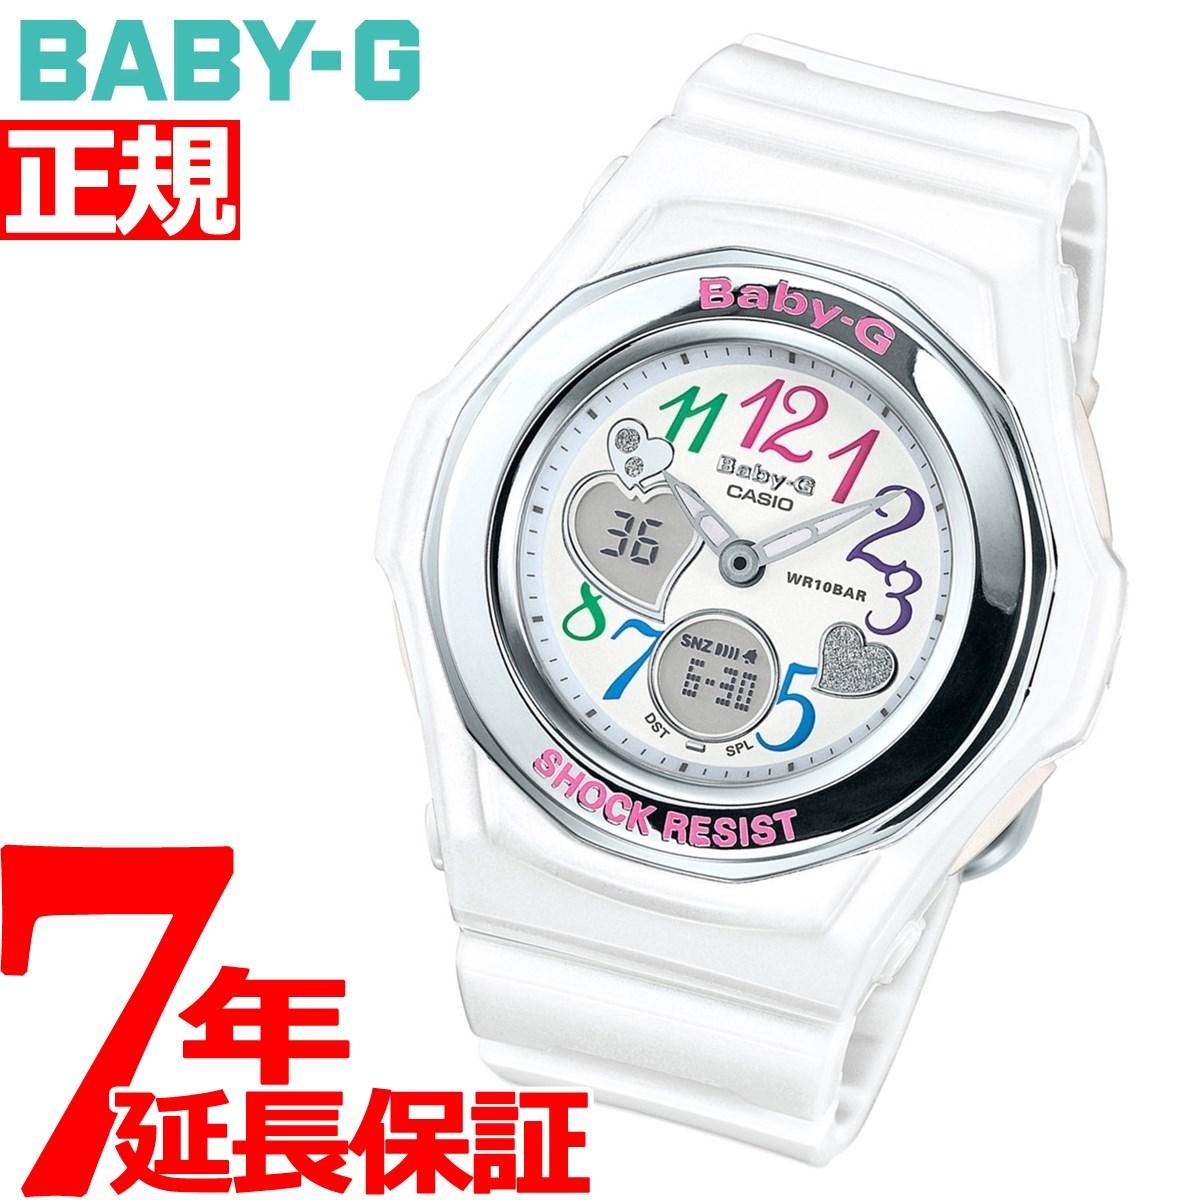 CASIO BABY-G カシオ ベビーG 腕時計 レディース 白 ホワイト アナデジ BGA-101-7B2JF【あす楽対応】【即納可】